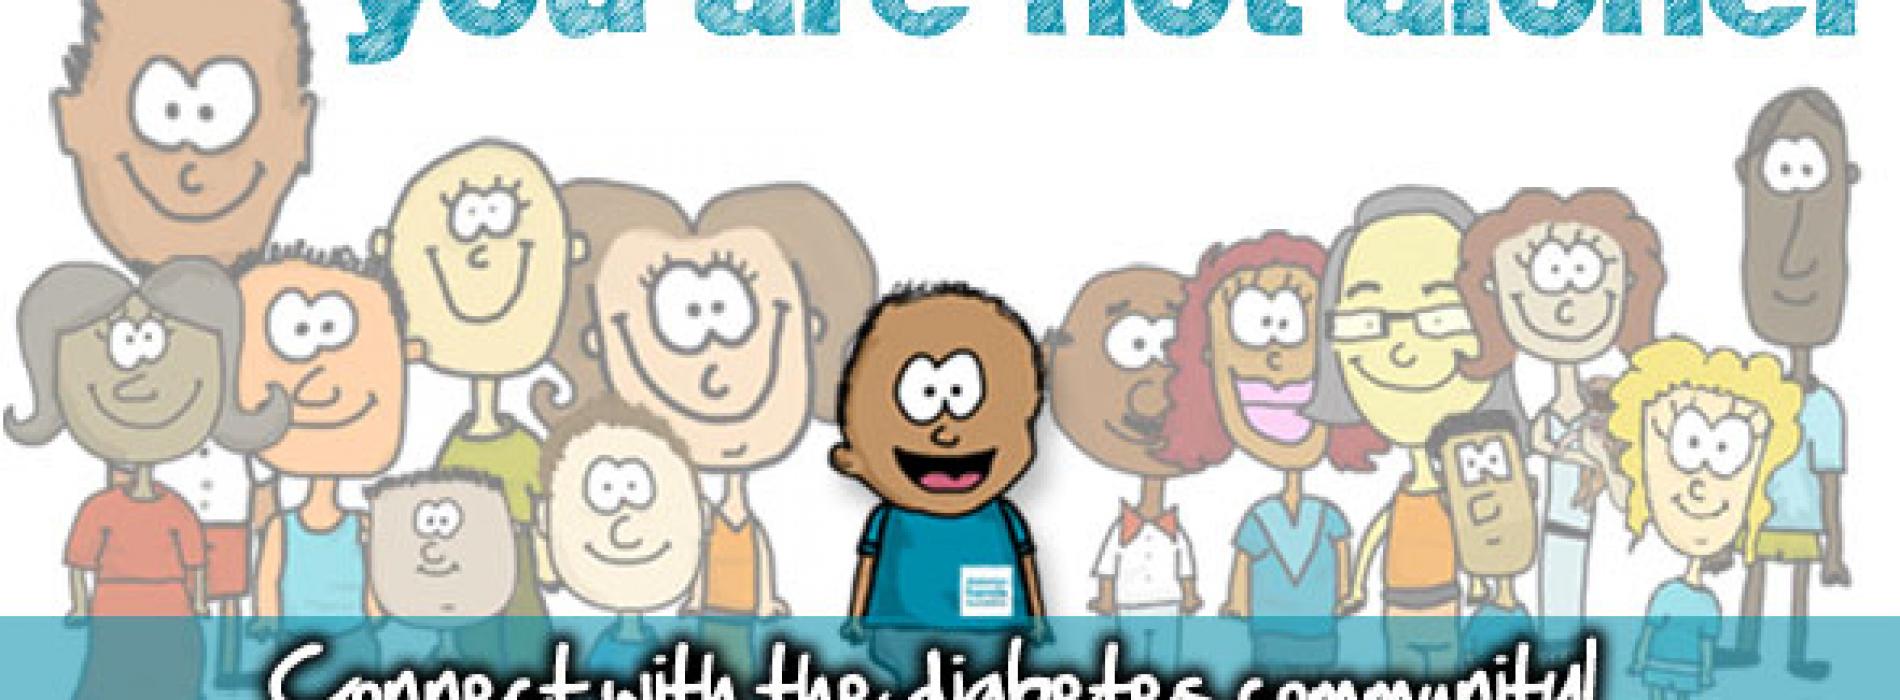 NHO Diabetes Portal opens!